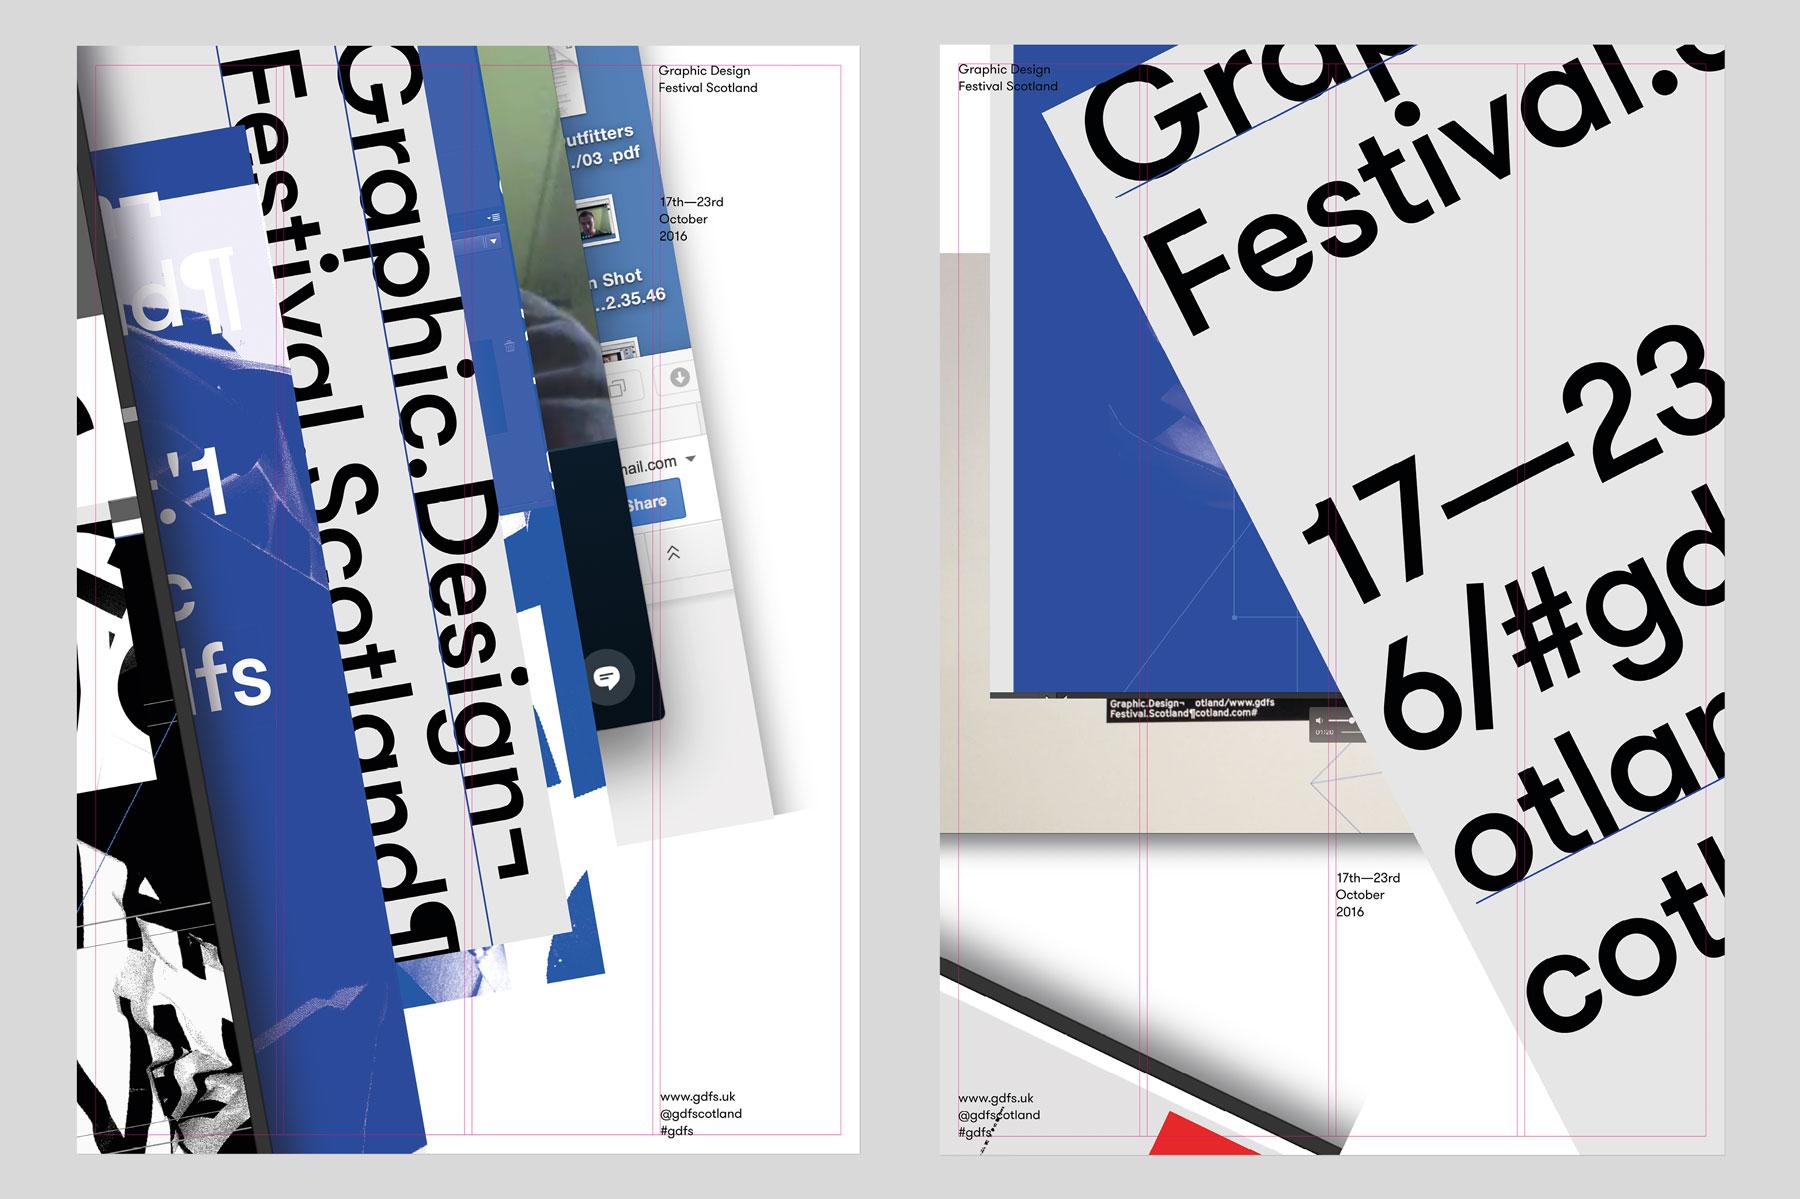 6gdfs-16-custom-identity-posters